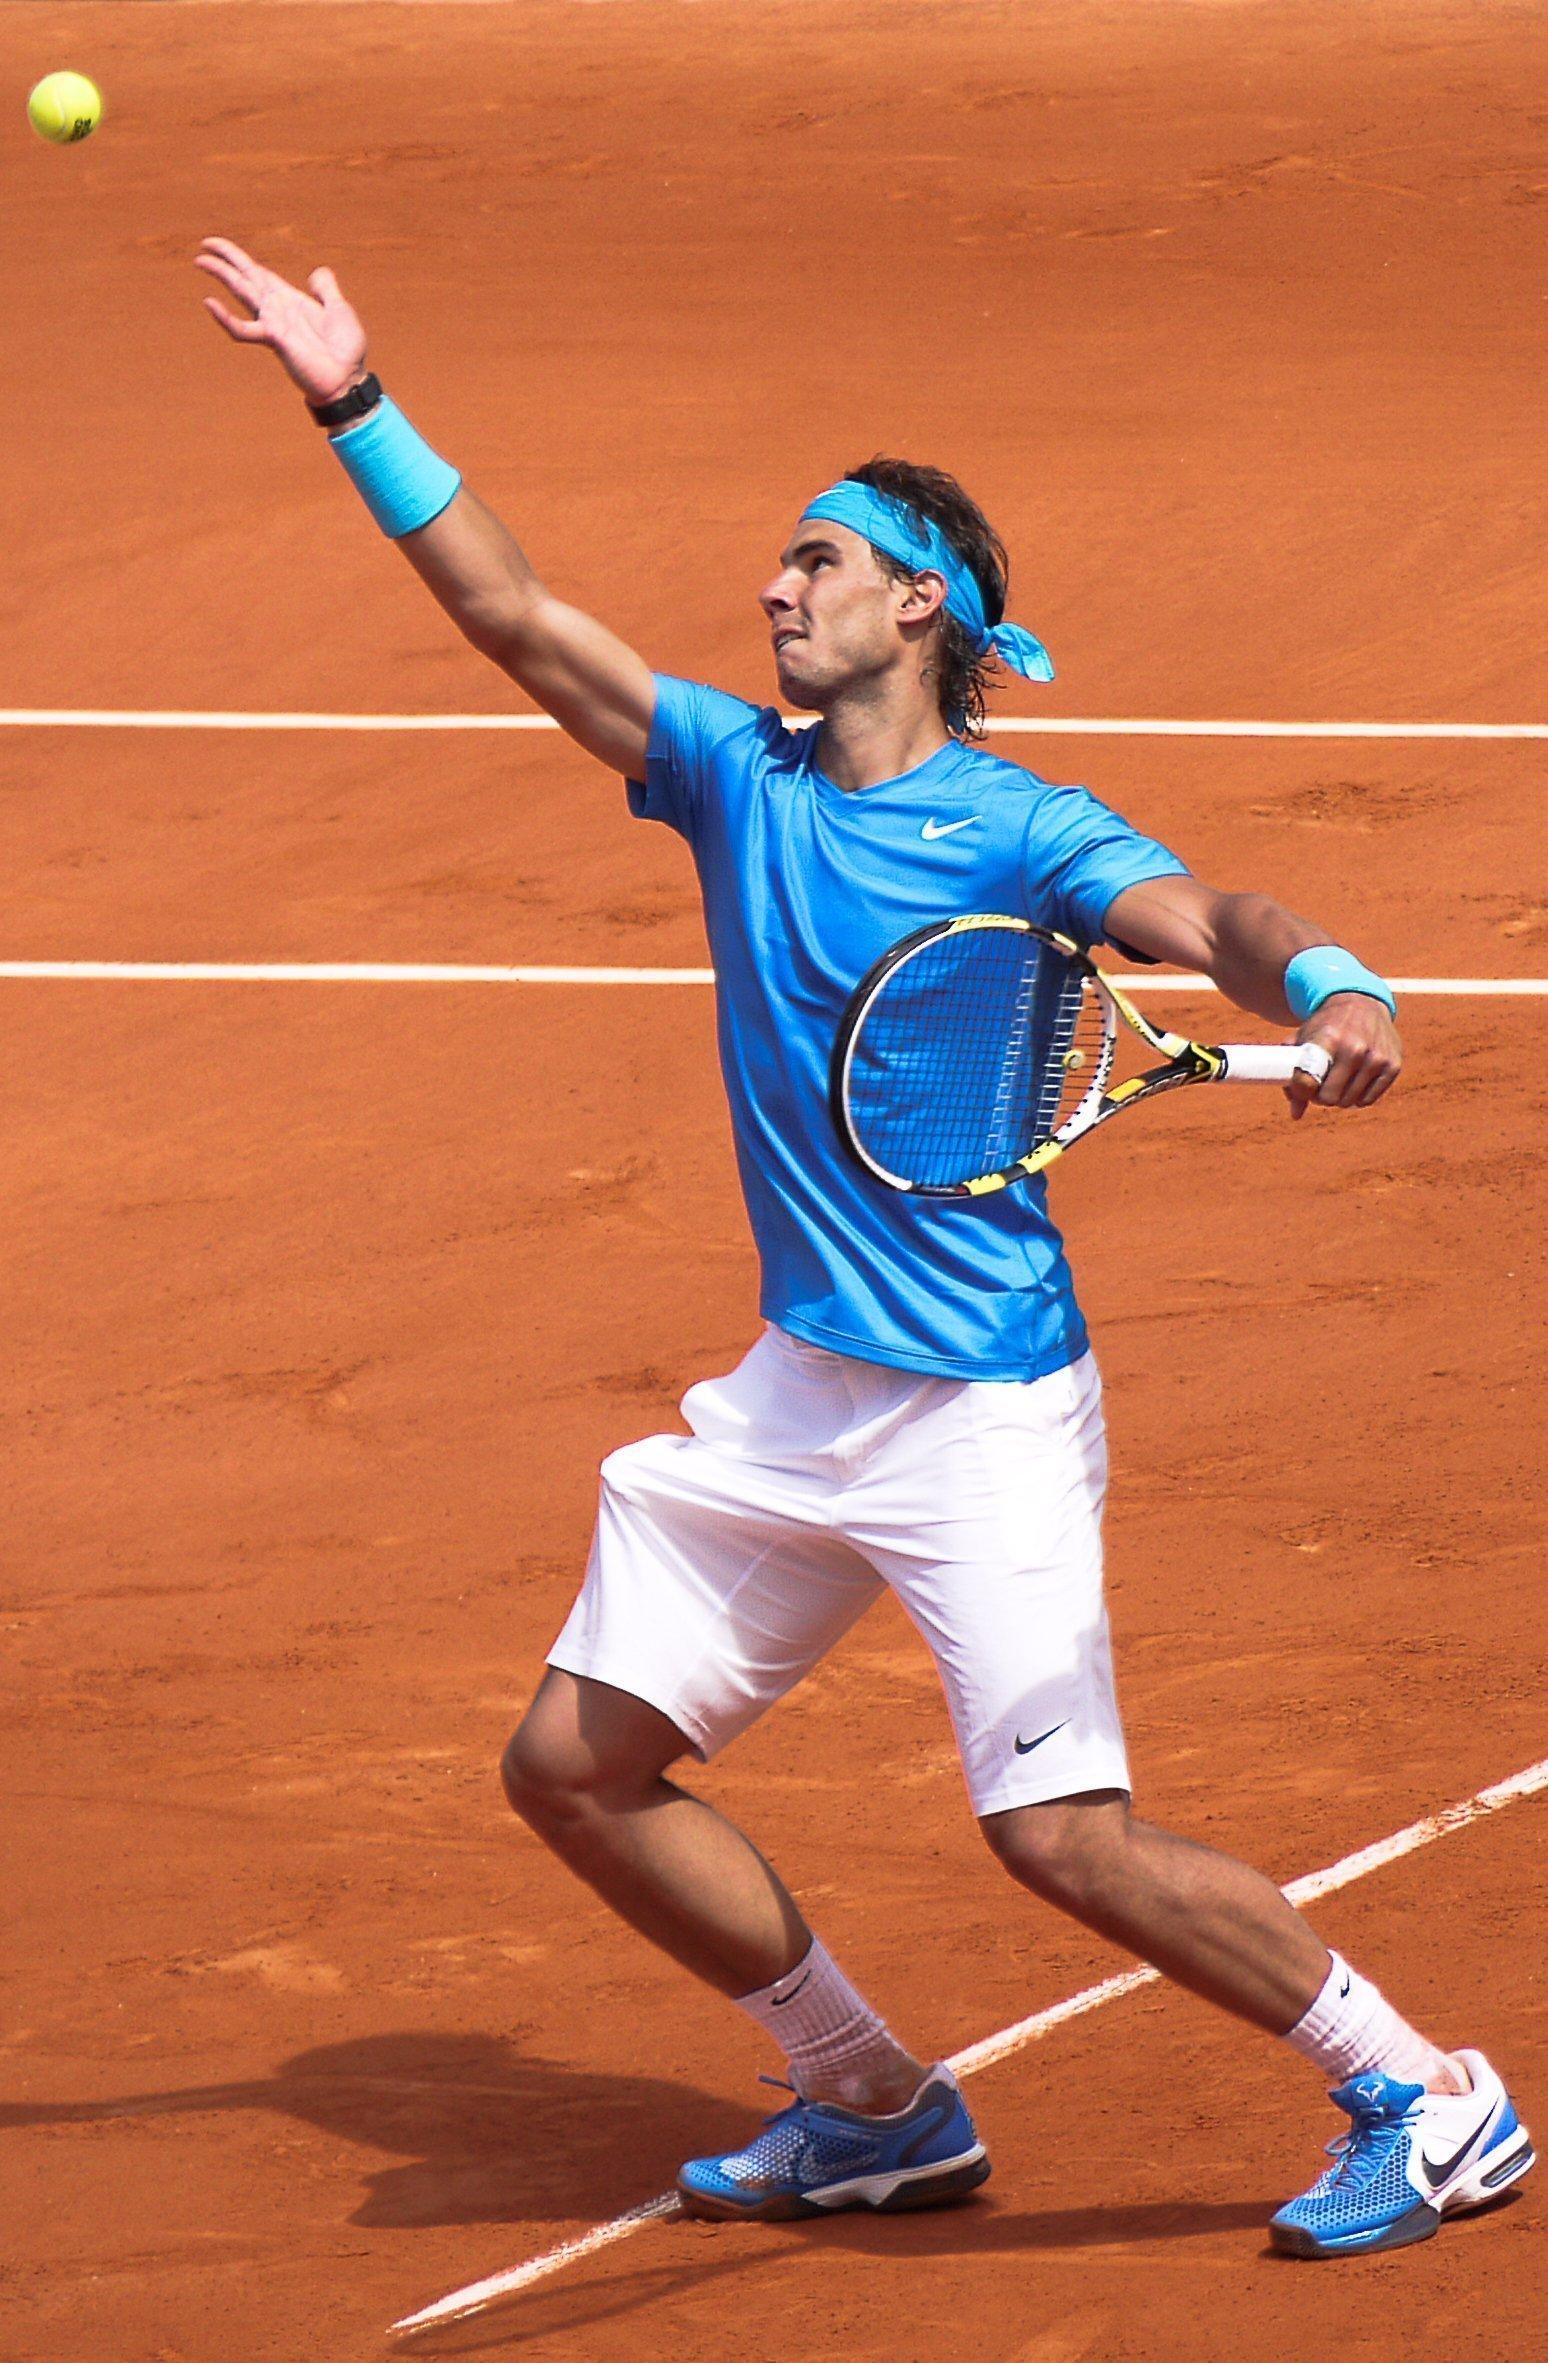 Rafael Nadal (ESP) def. John Isner (USA)Roland Garros 2011 - mardi 24 mai - 1er tour - Court Philippe Chatrier